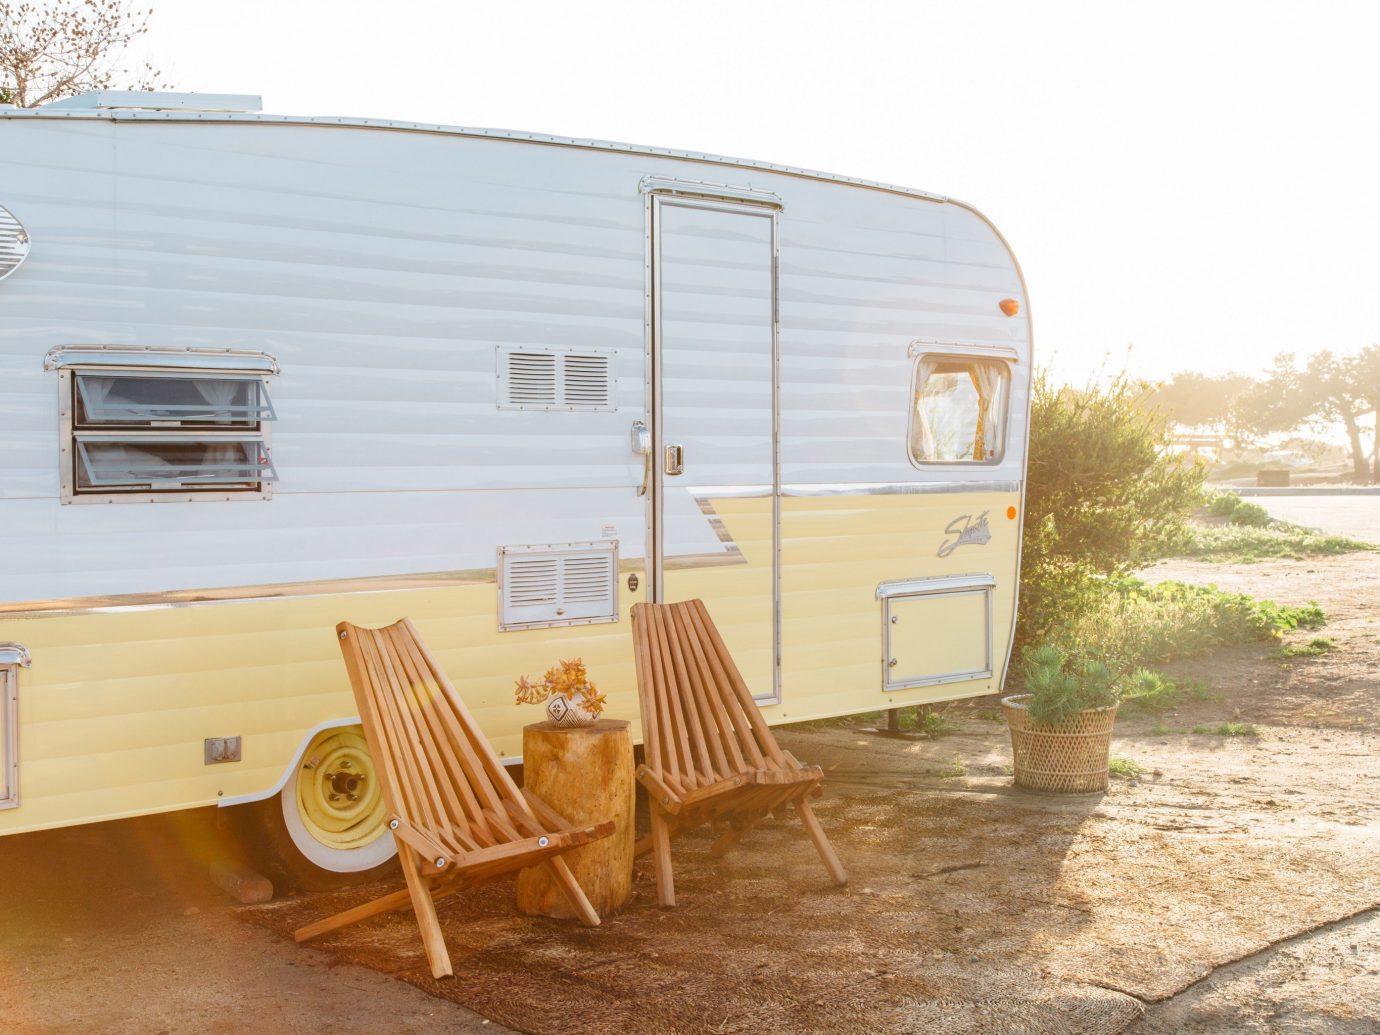 Trip Ideas sky trailer vehicle property camper cottage wooden real estate